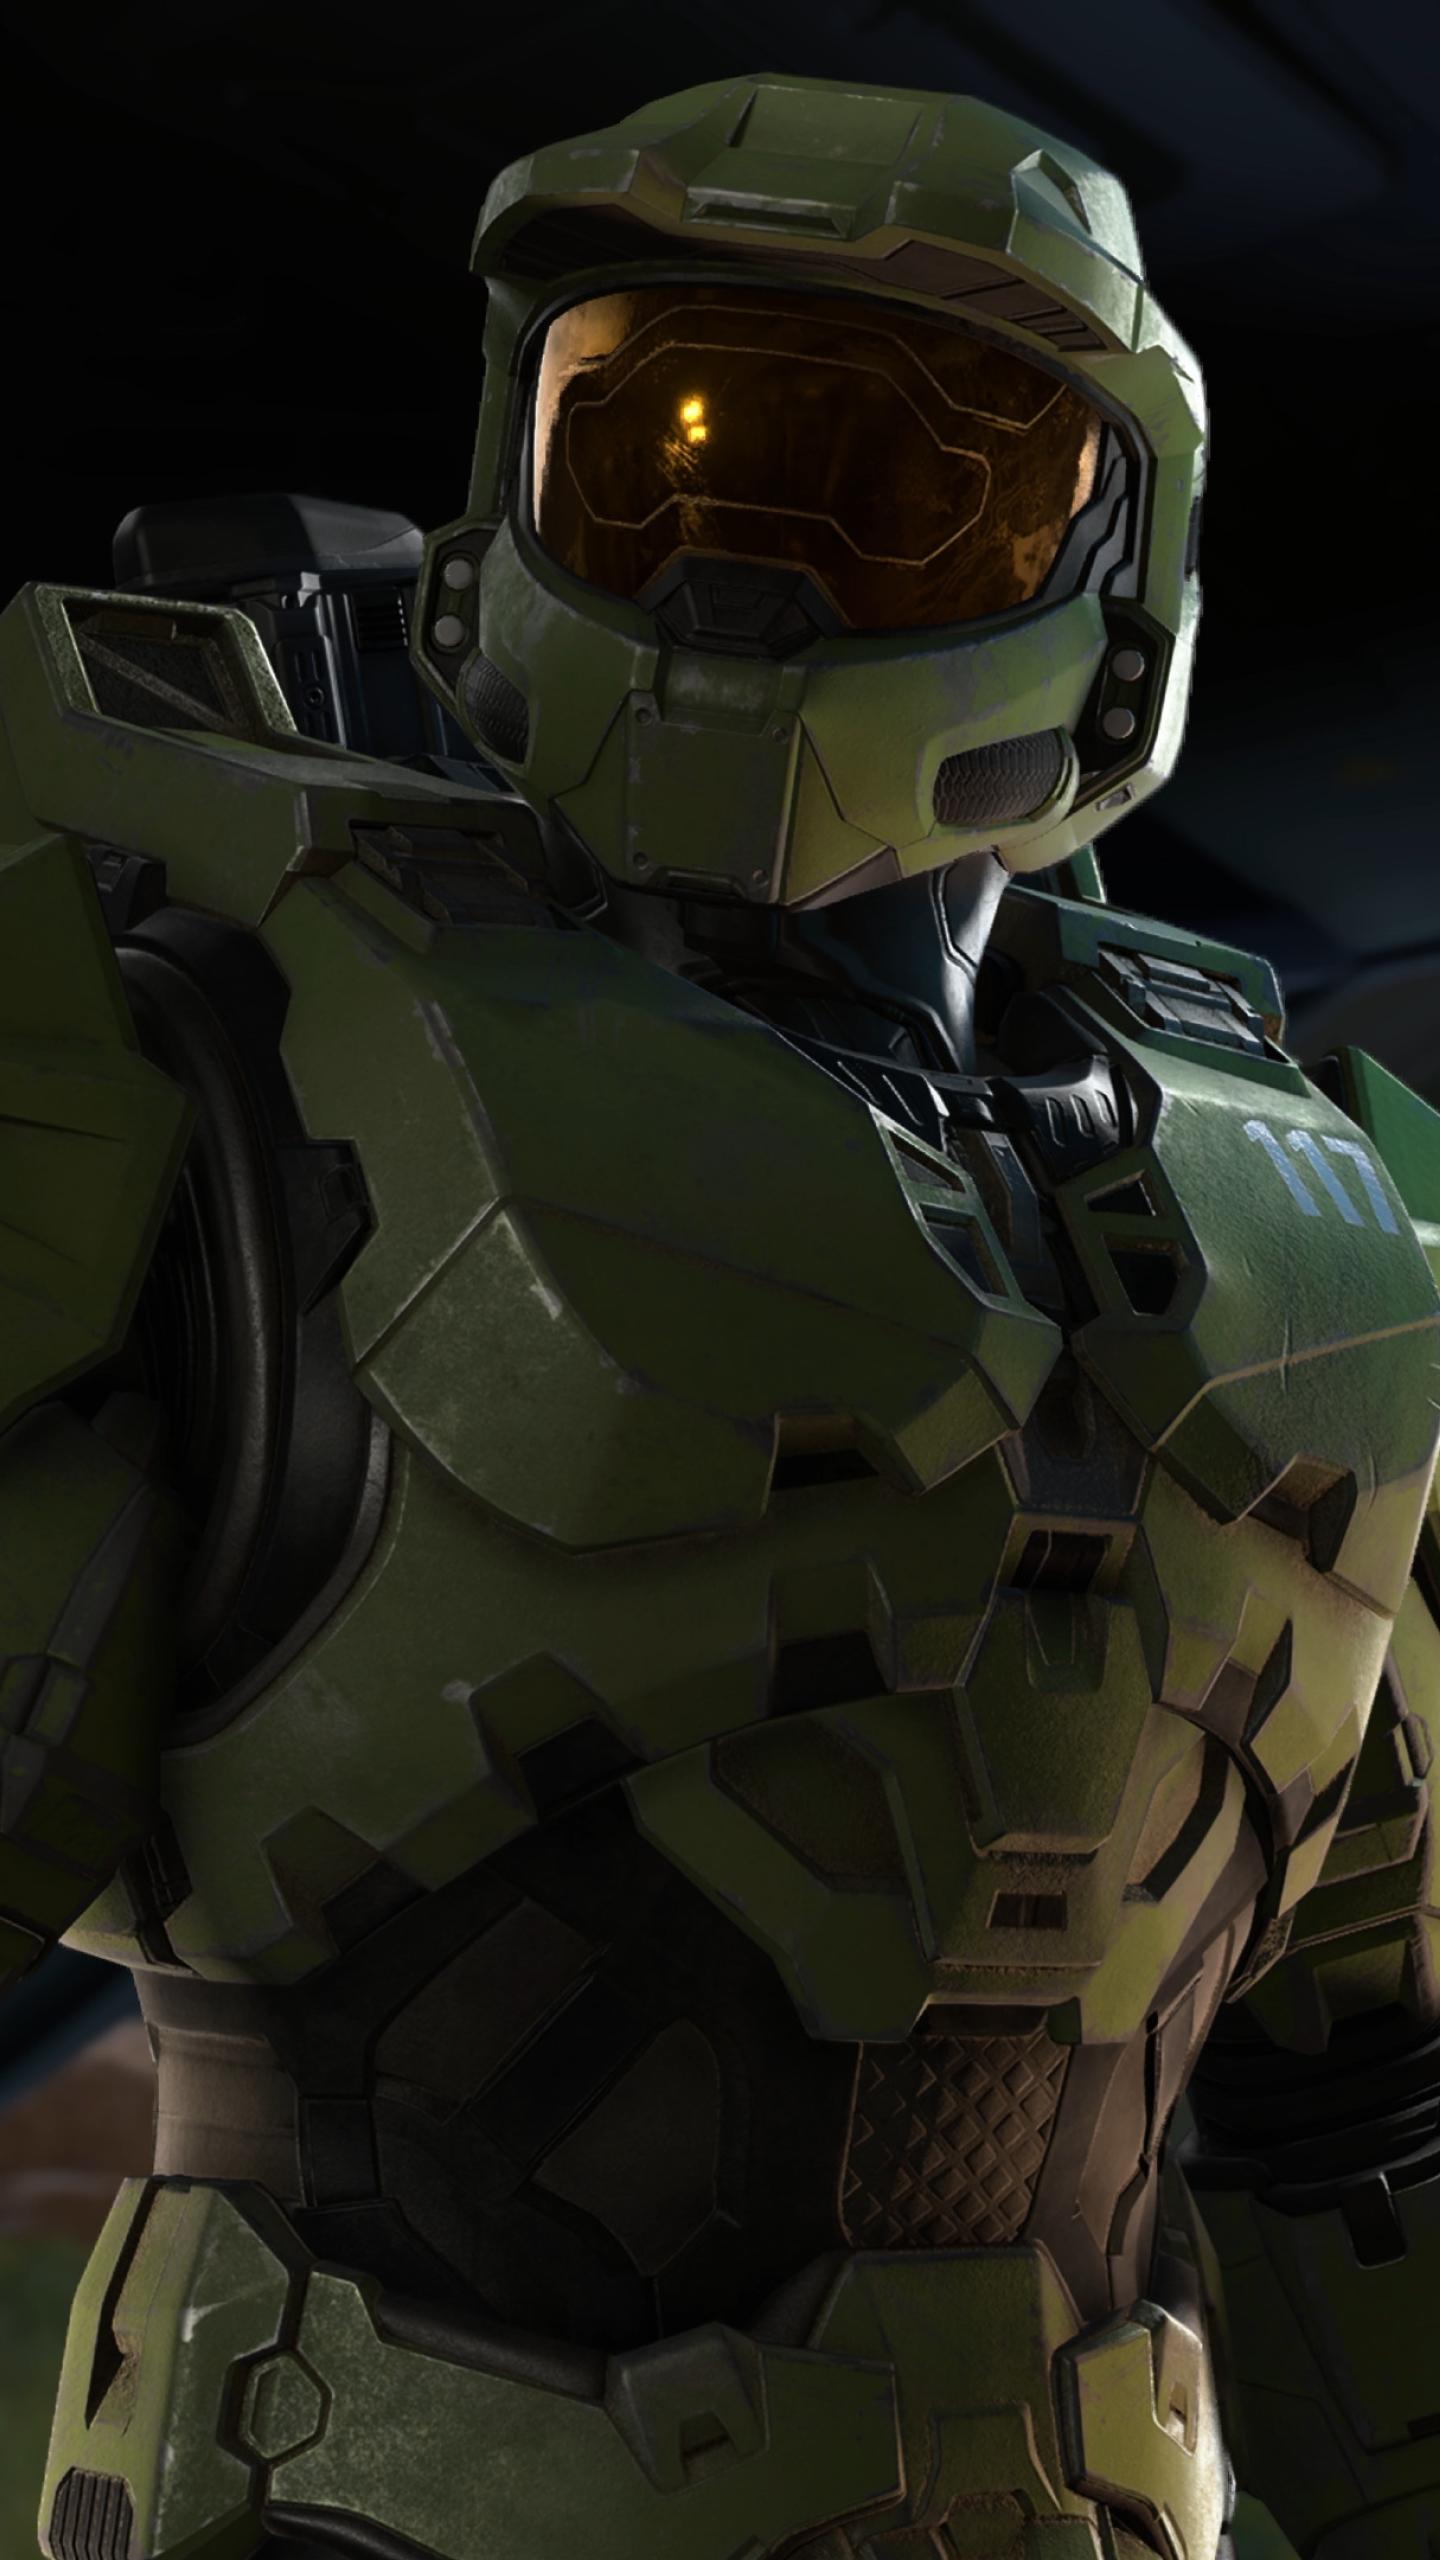 New Halo Infinite 4K Wallpaper in 1440x2560 Resolution